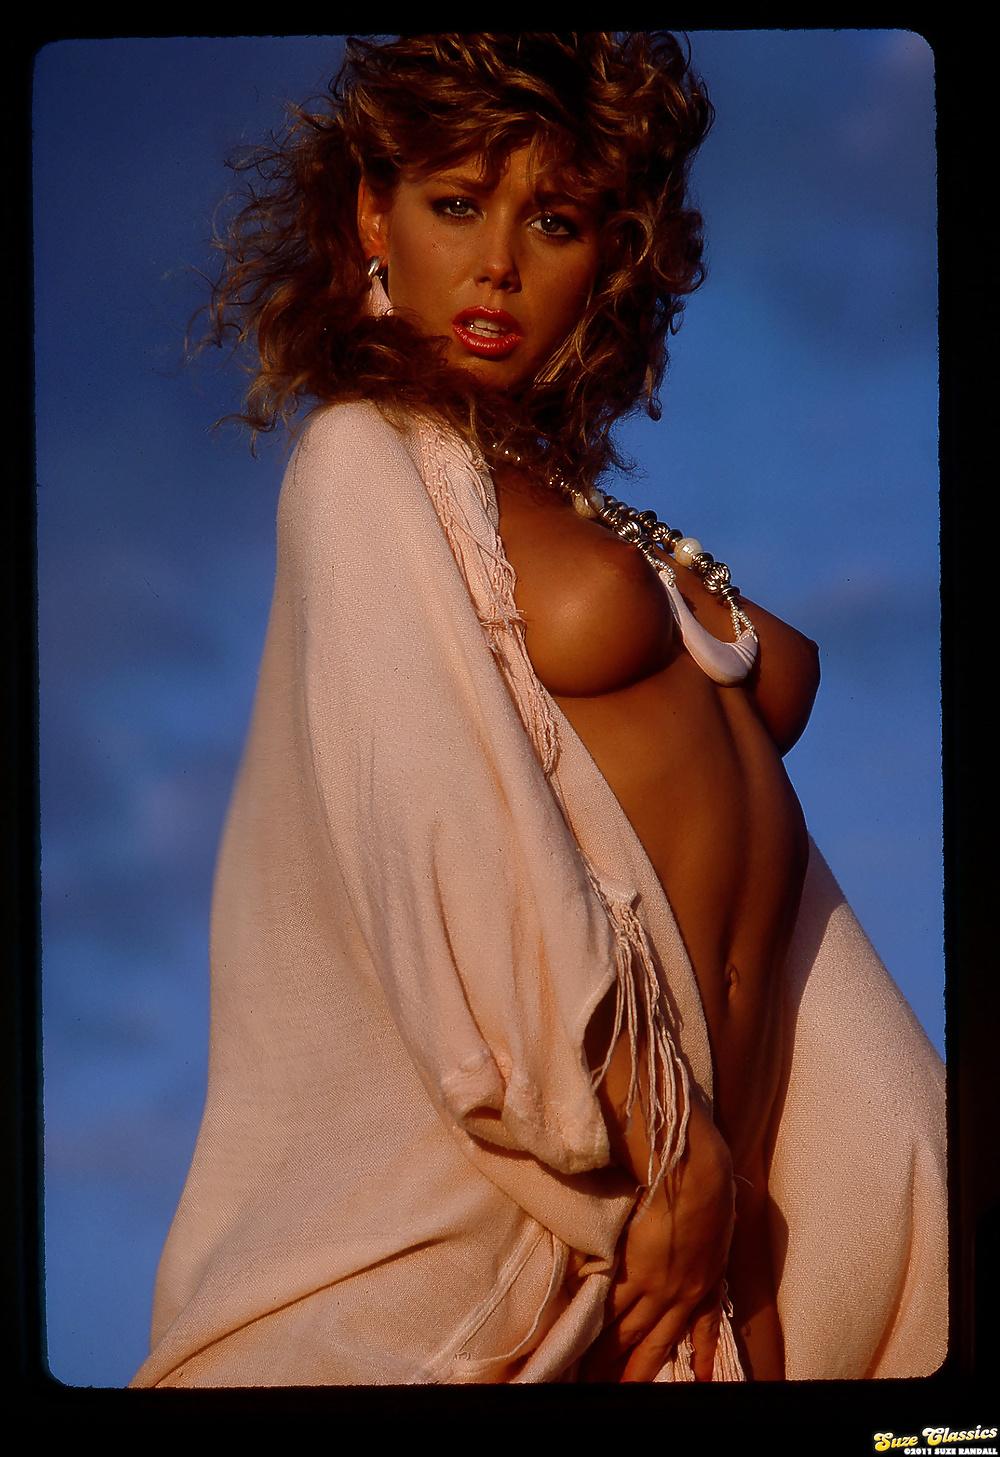 blondie-bee-porn-star-latinas-san-diego-naked-girls